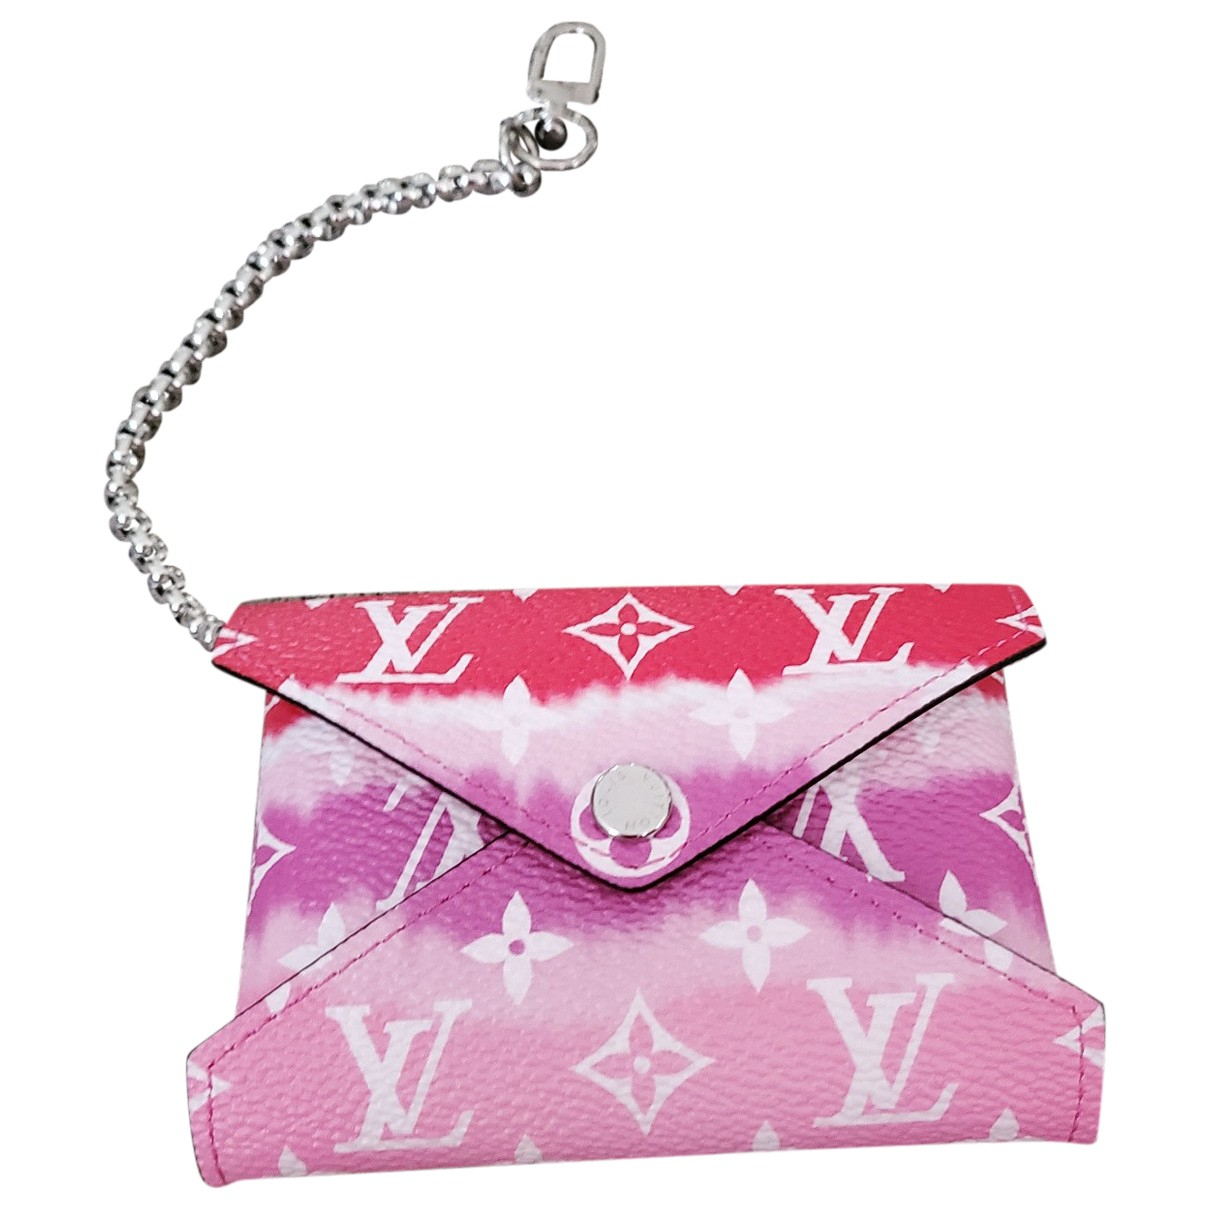 Cartera Kirigami de Lona Louis Vuitton